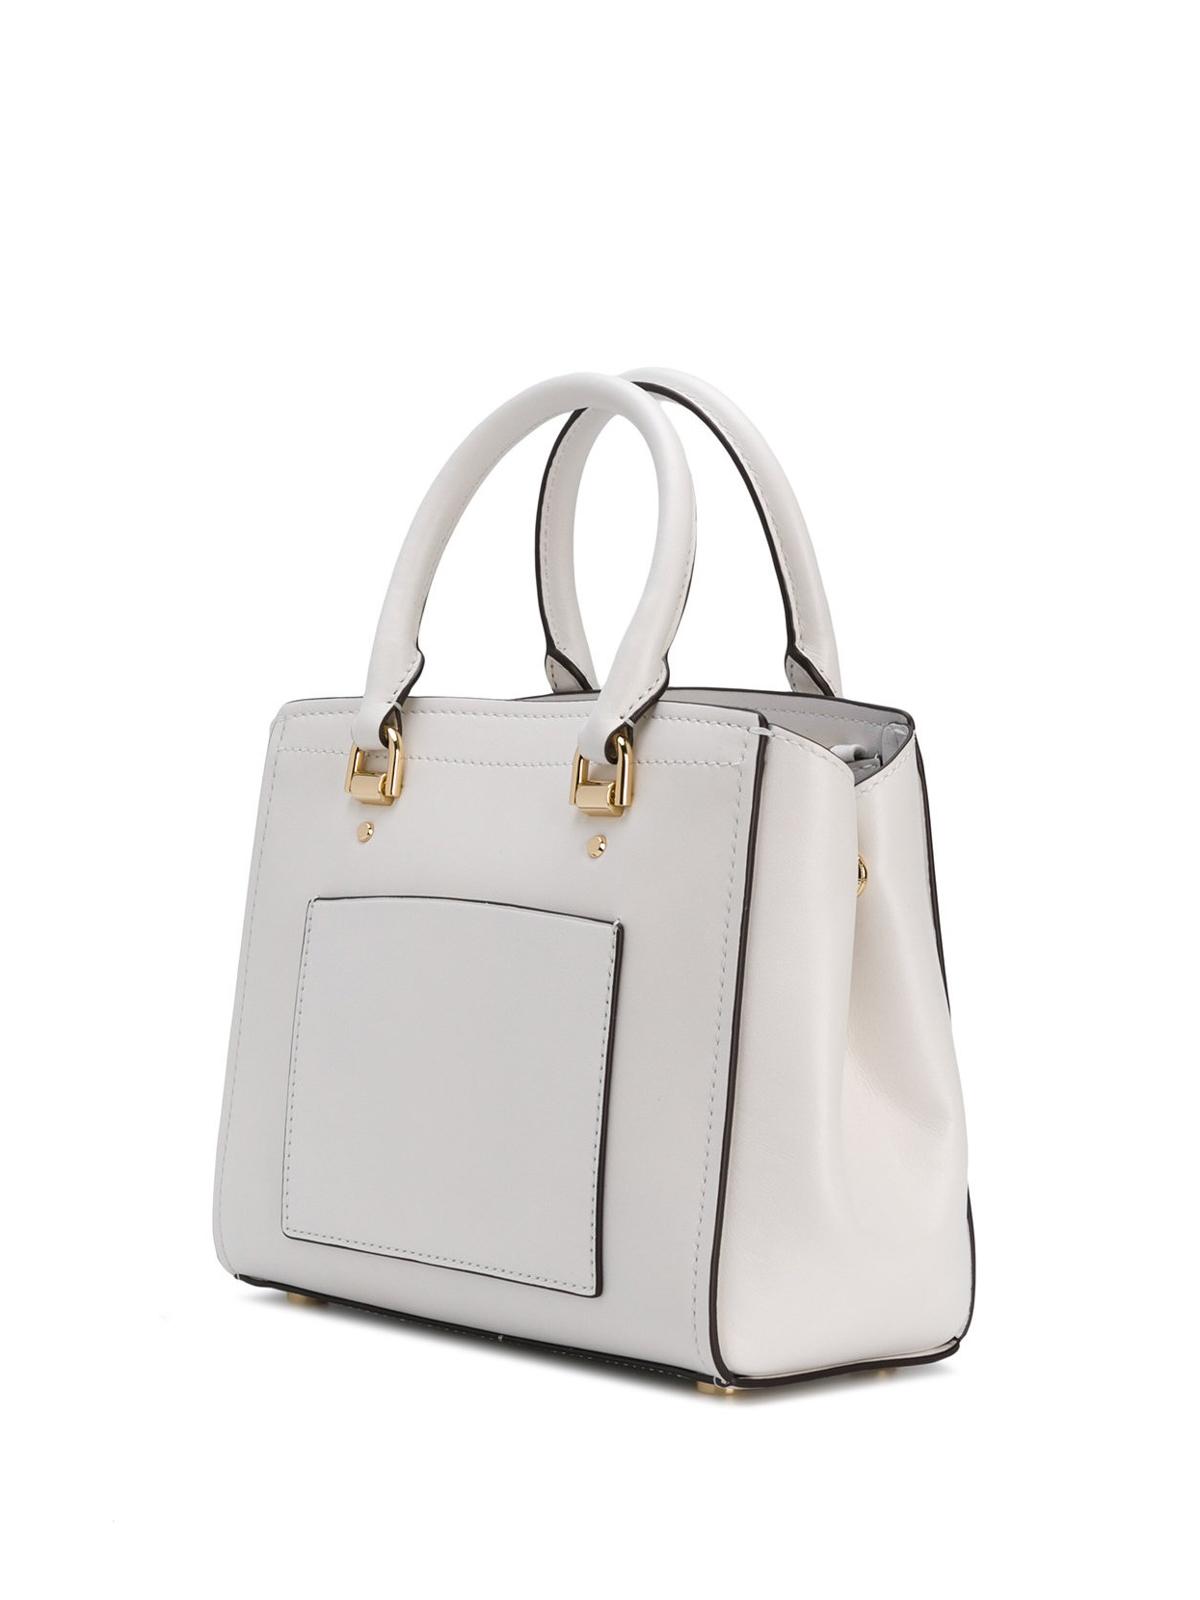 low price michael kors grey bowling bag 0e554 25aa9